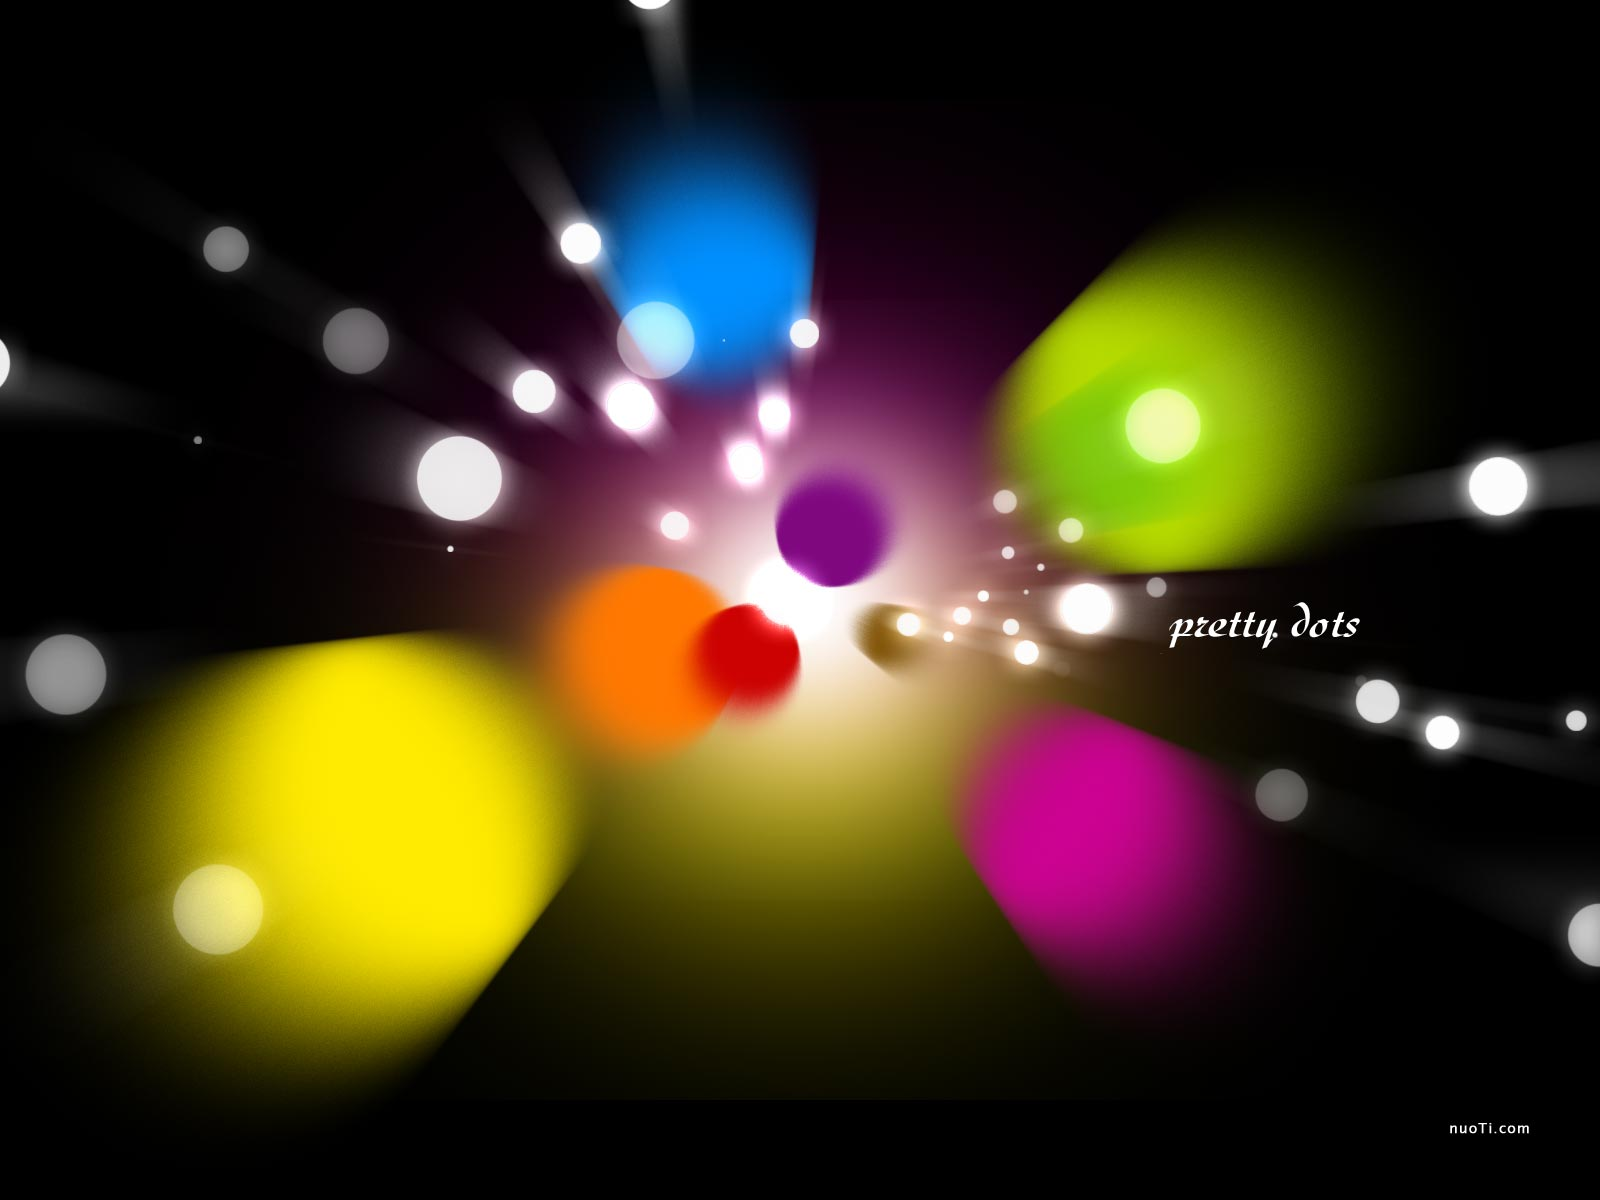 http://4.bp.blogspot.com/_HljMw3ek9D8/TNS7YTJCZjI/AAAAAAAAACA/f1Sdi3hUpLY/s1600/polka-dot-day.jpg